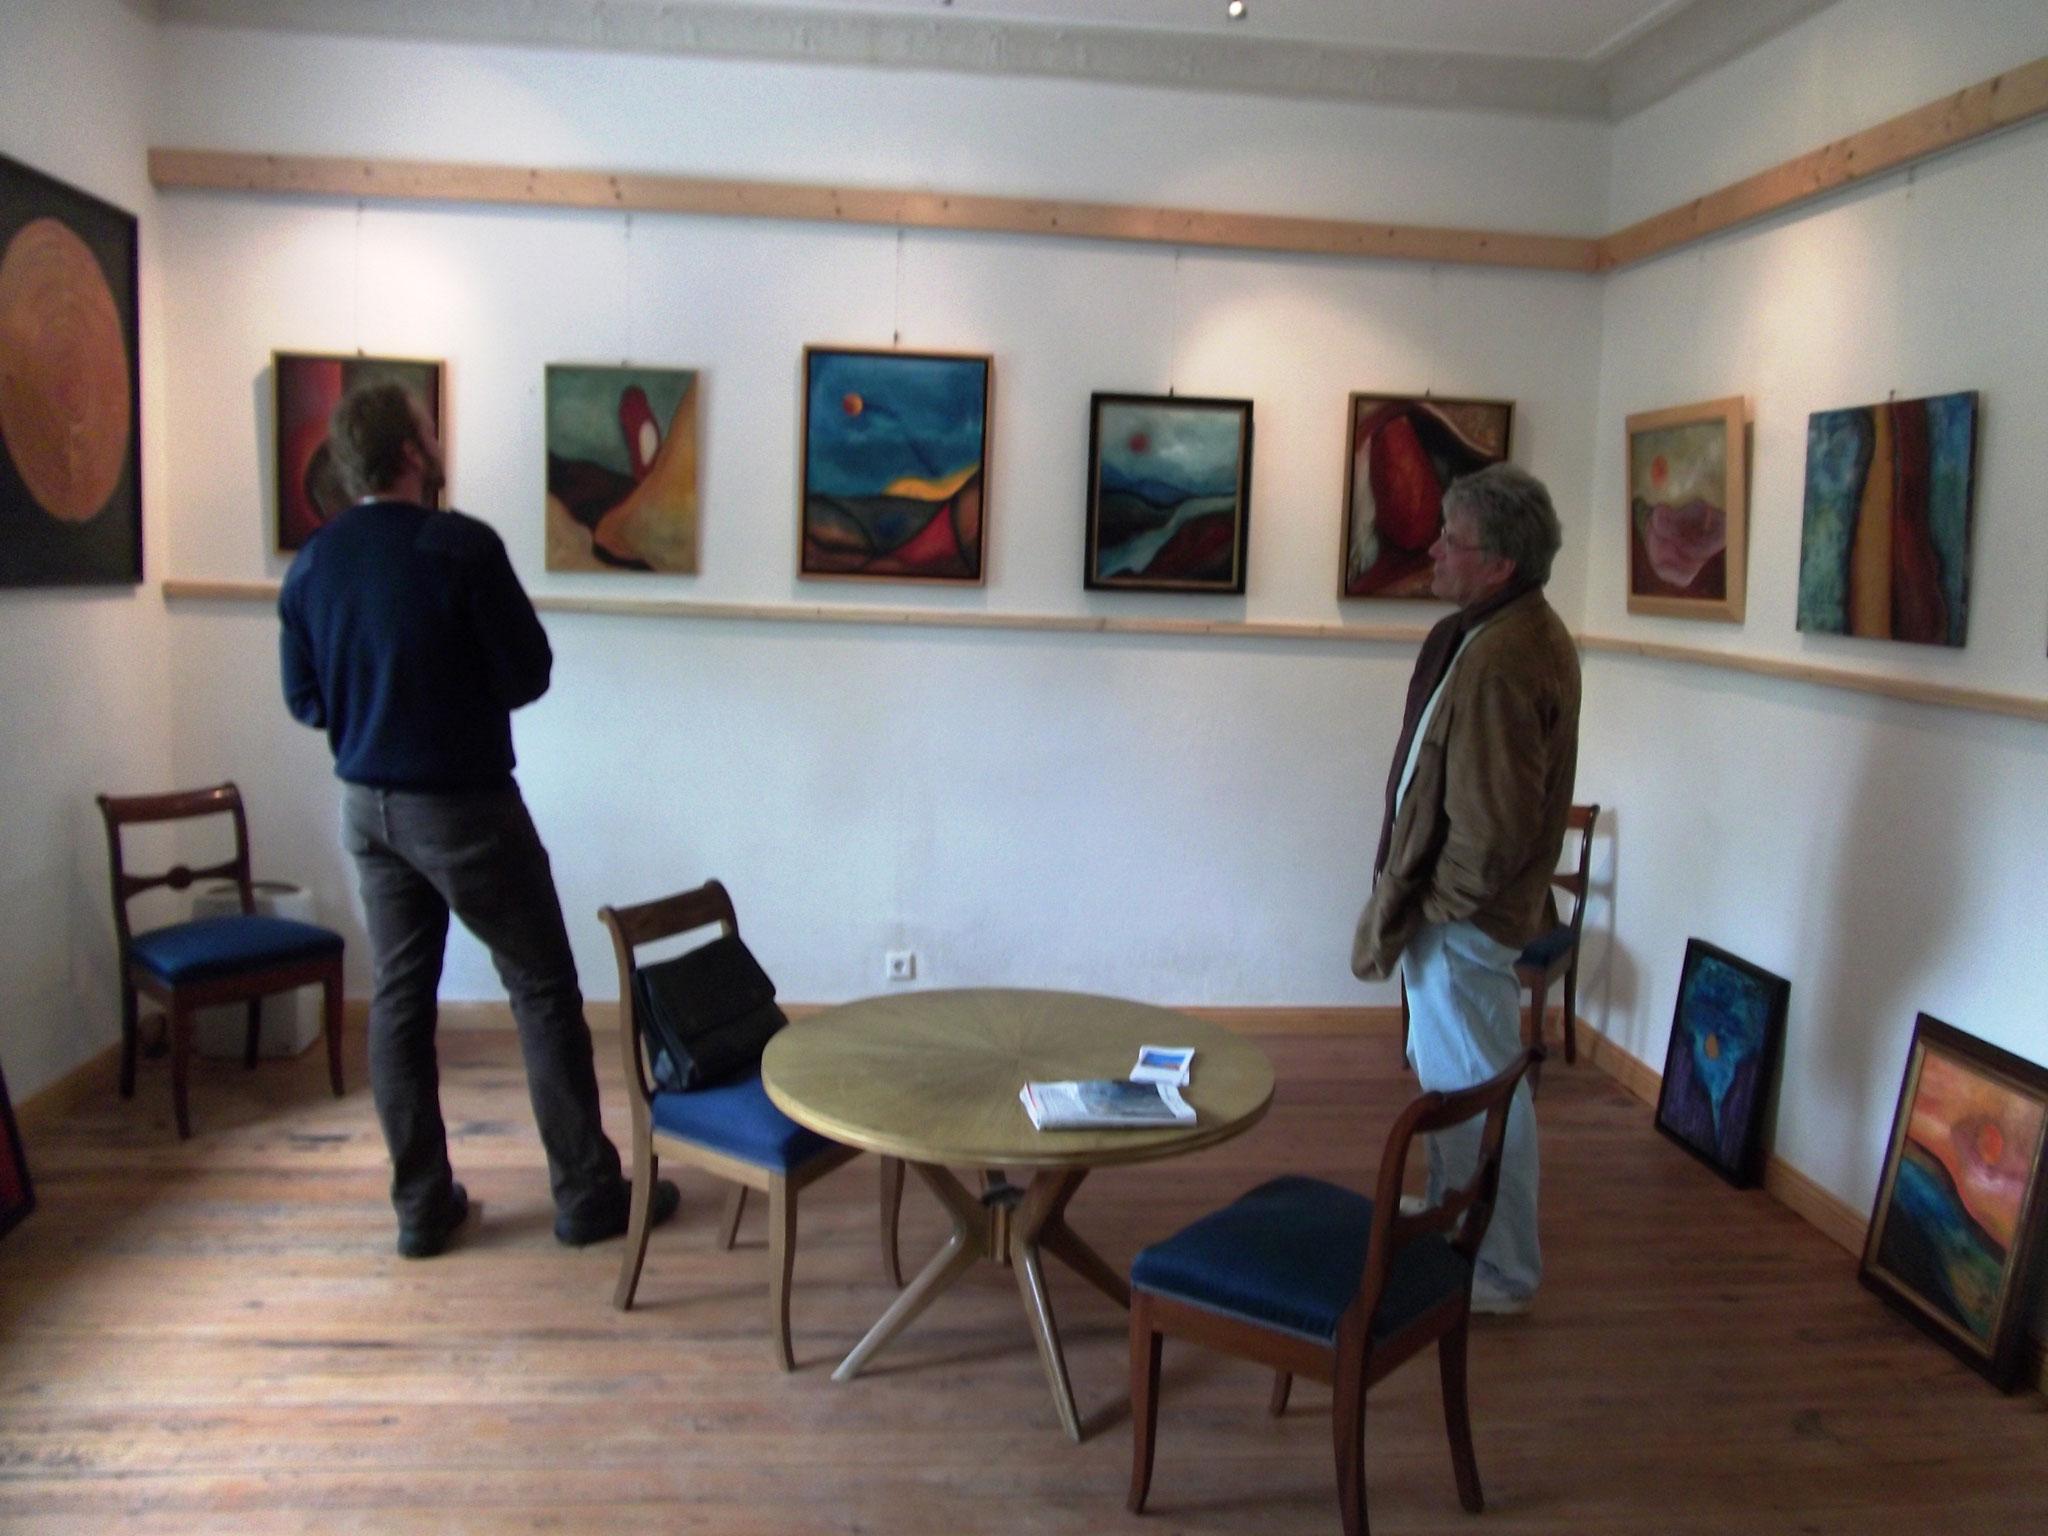 Tönning 2011 - Ladenalerie Postelhof